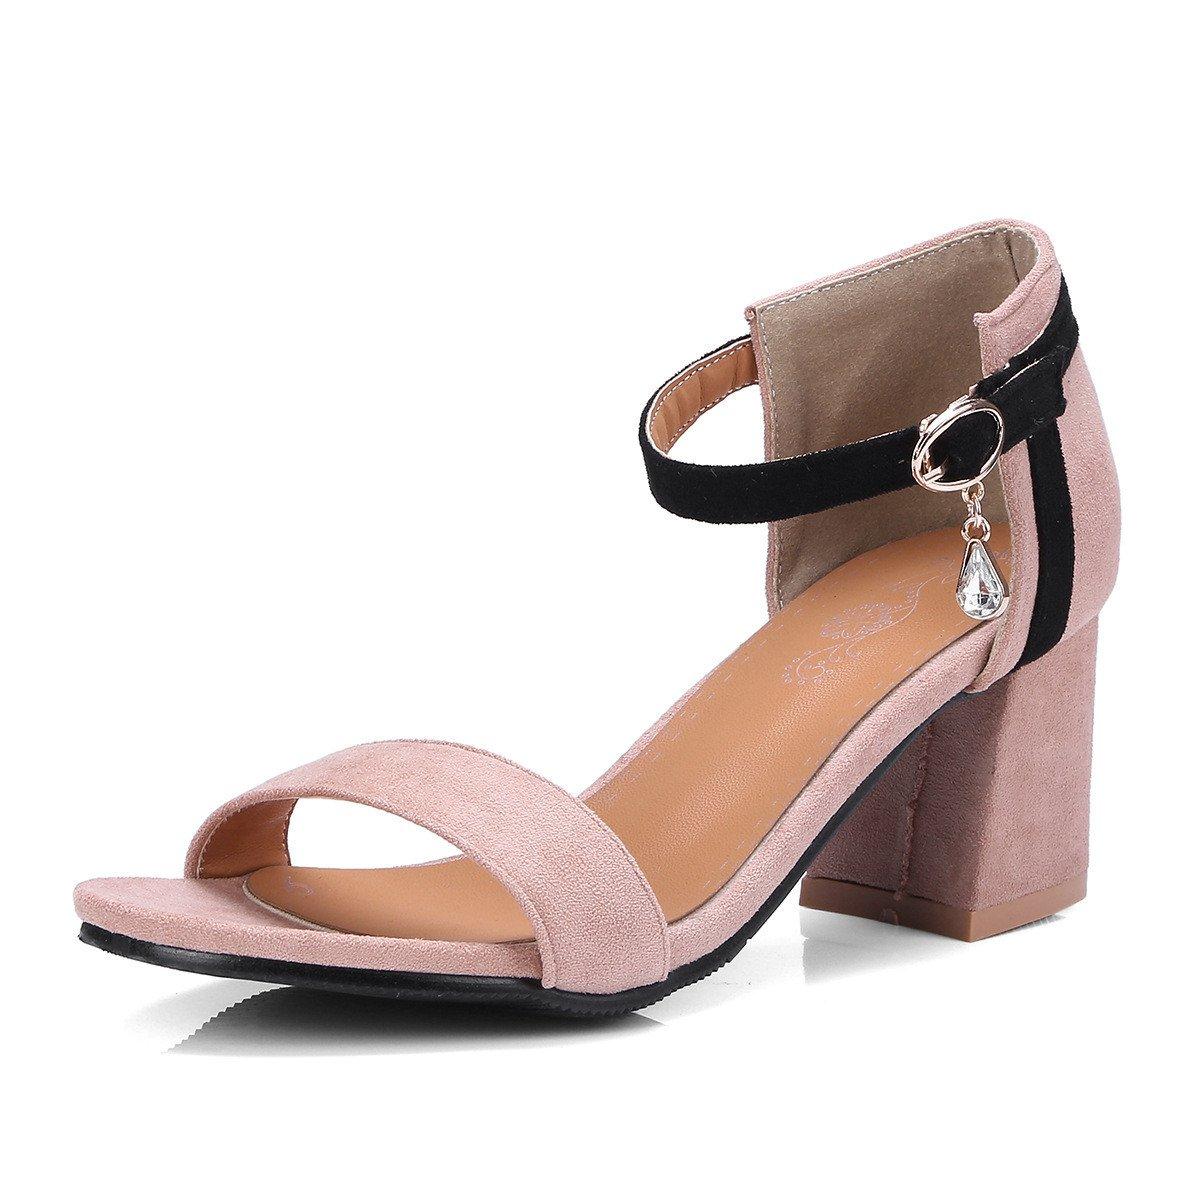 Summer high-heeled dew-Größe code satin rough with high-heeled Summer Damens Sandales Pink 060812